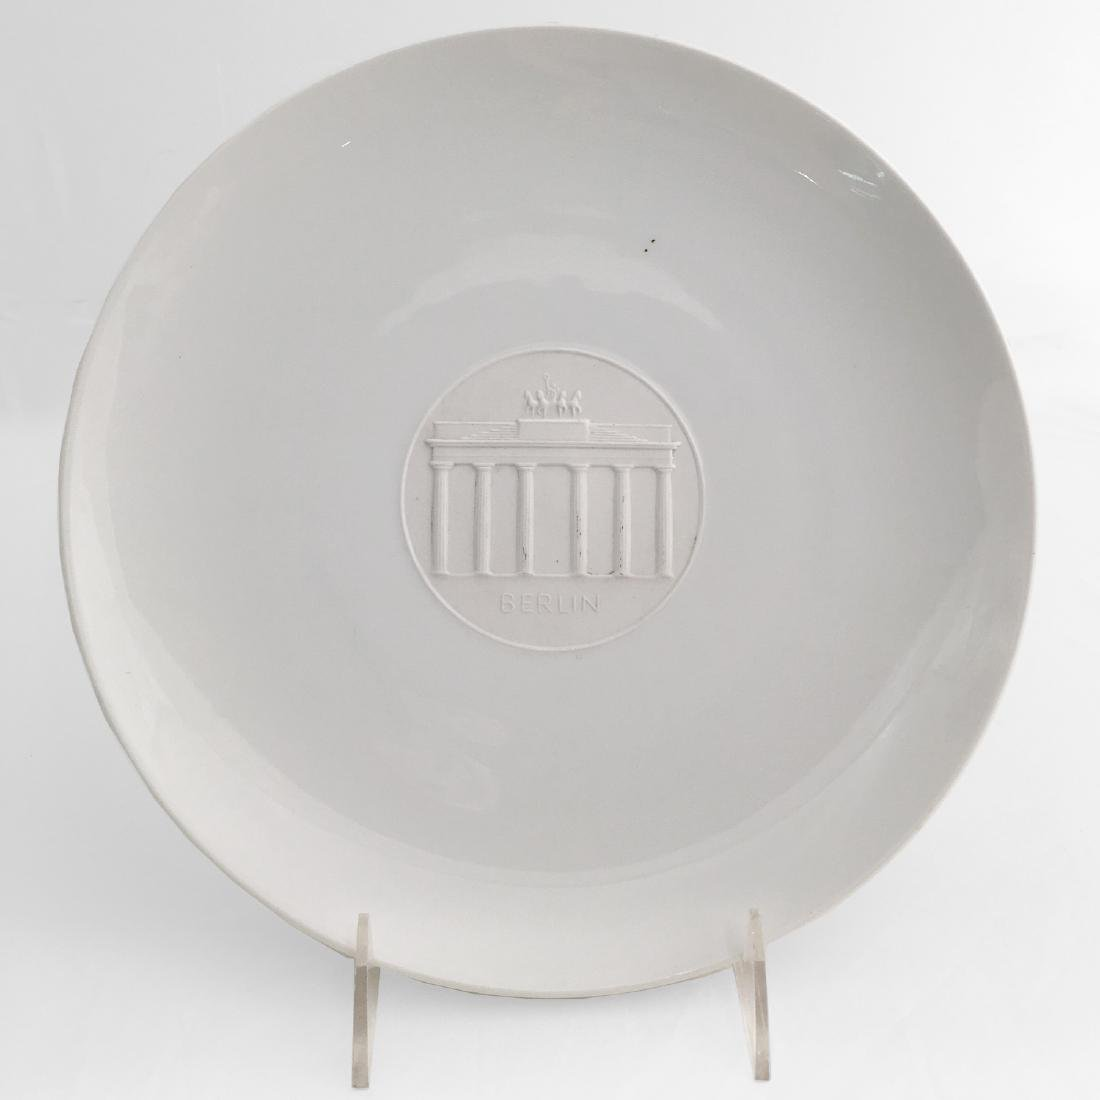 KPM Porcelain Plate Commemorating Berlin